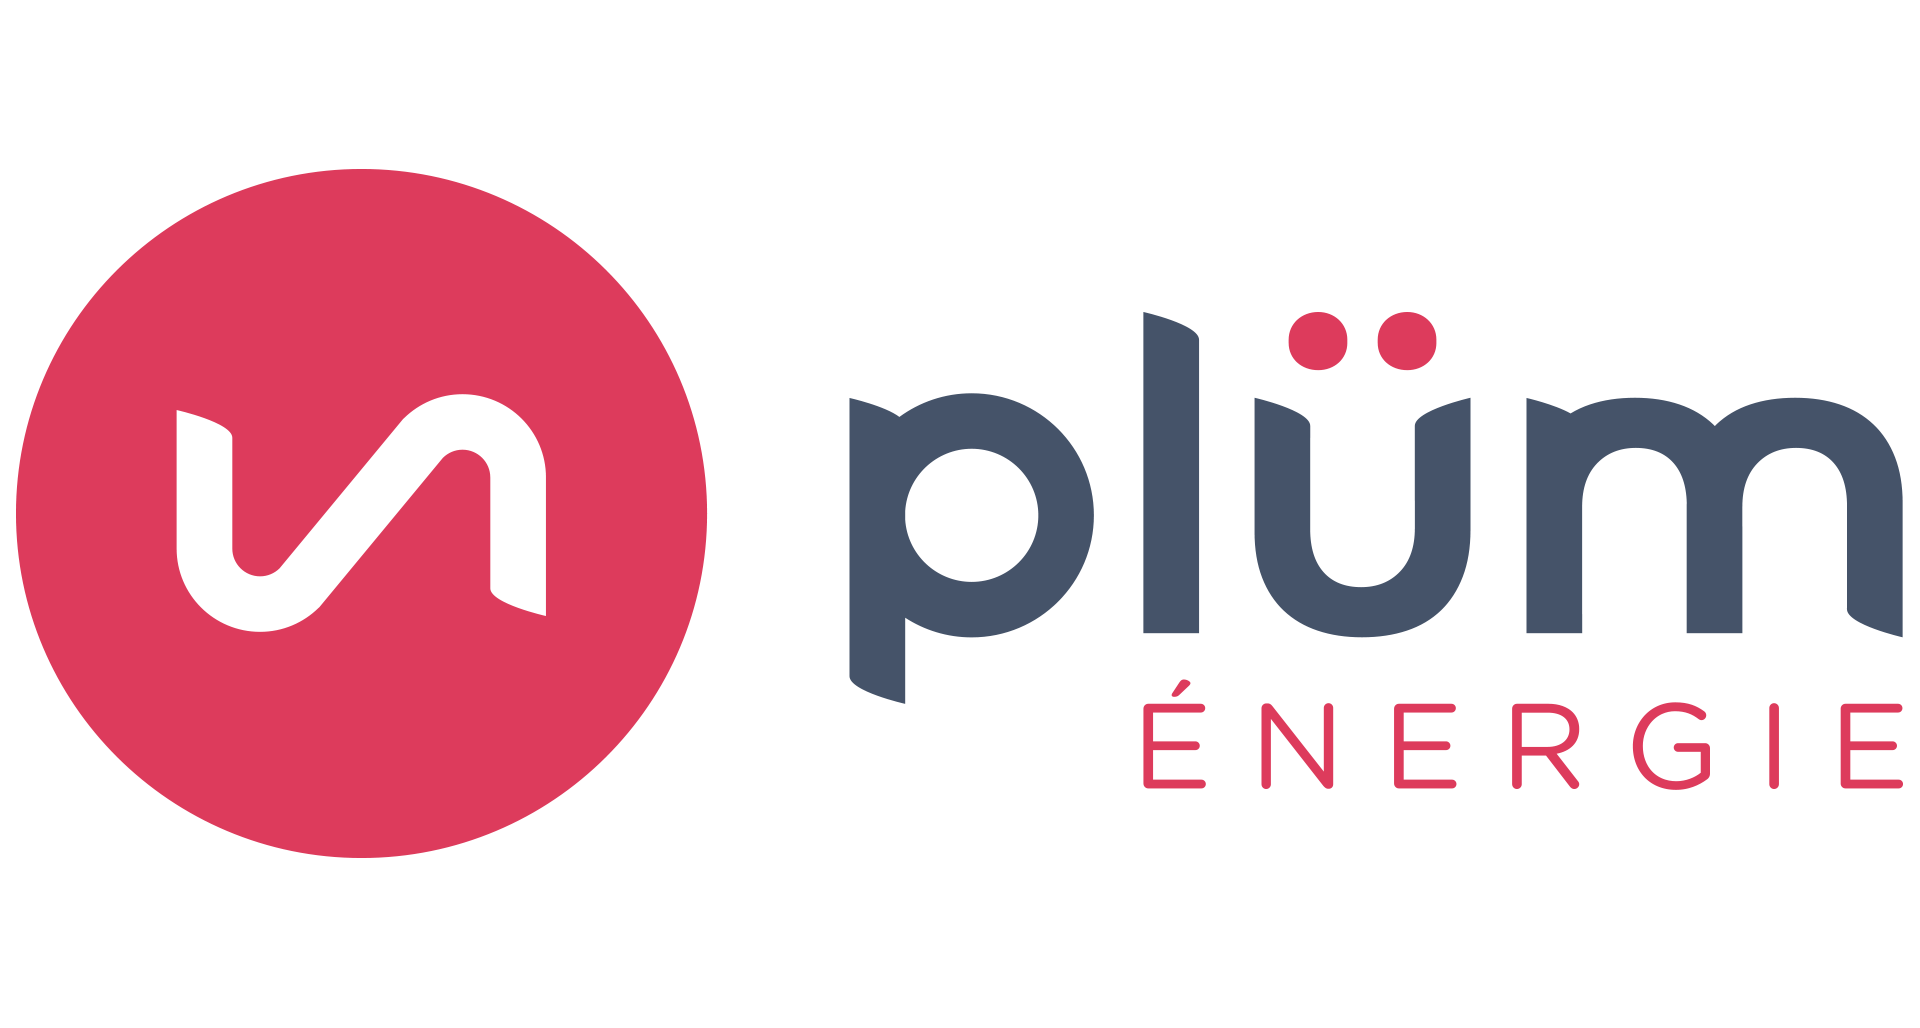 Plüm Energie